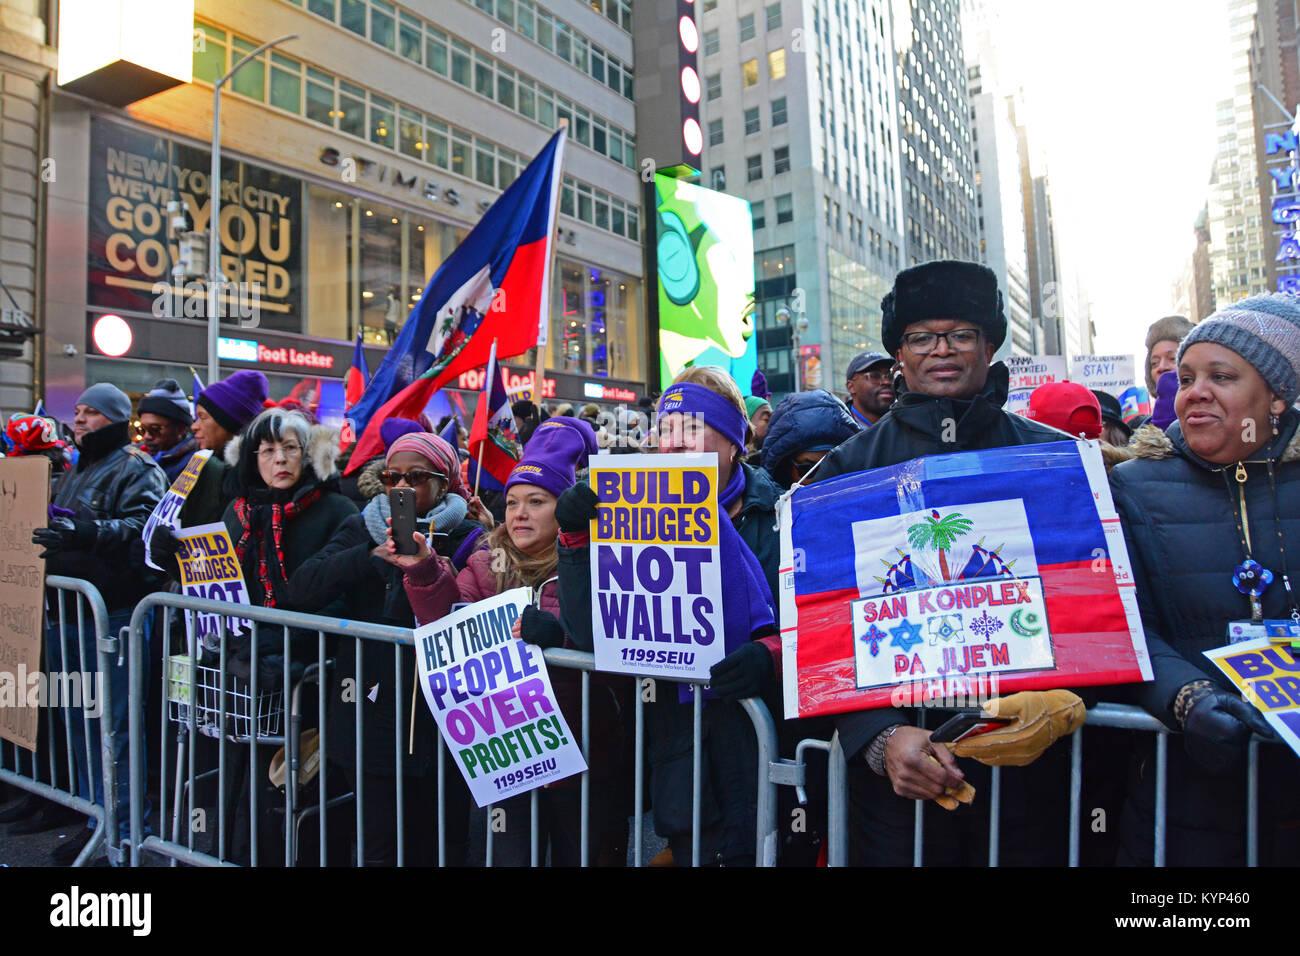 Haiti Protest Stock Photos & Haiti Protest Stock Images - Alamy